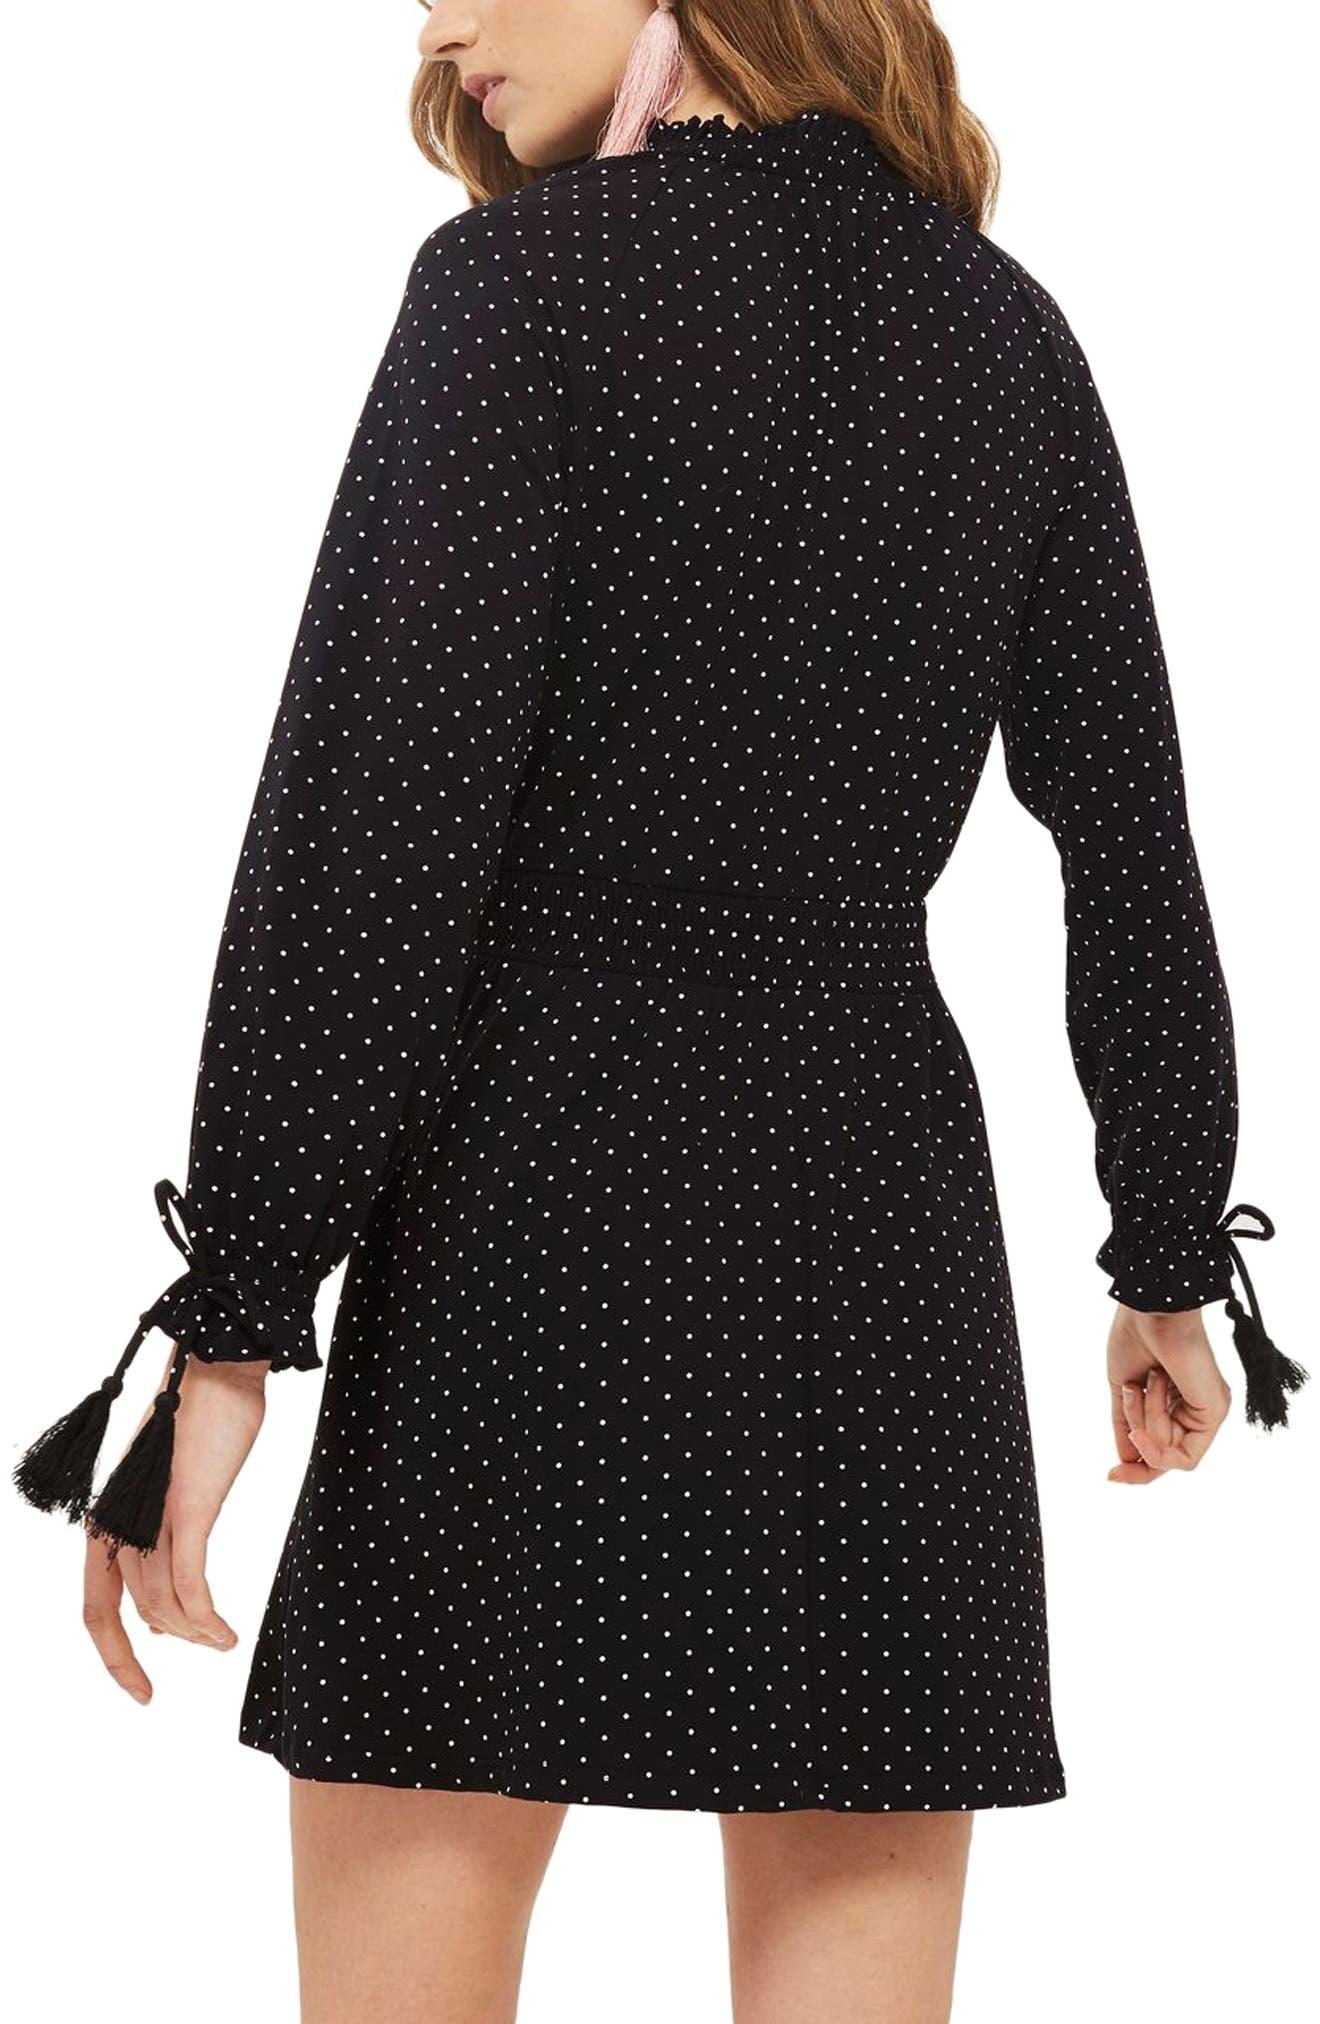 Polka Dot Shirred Waist Dress,                             Alternate thumbnail 2, color,                             001